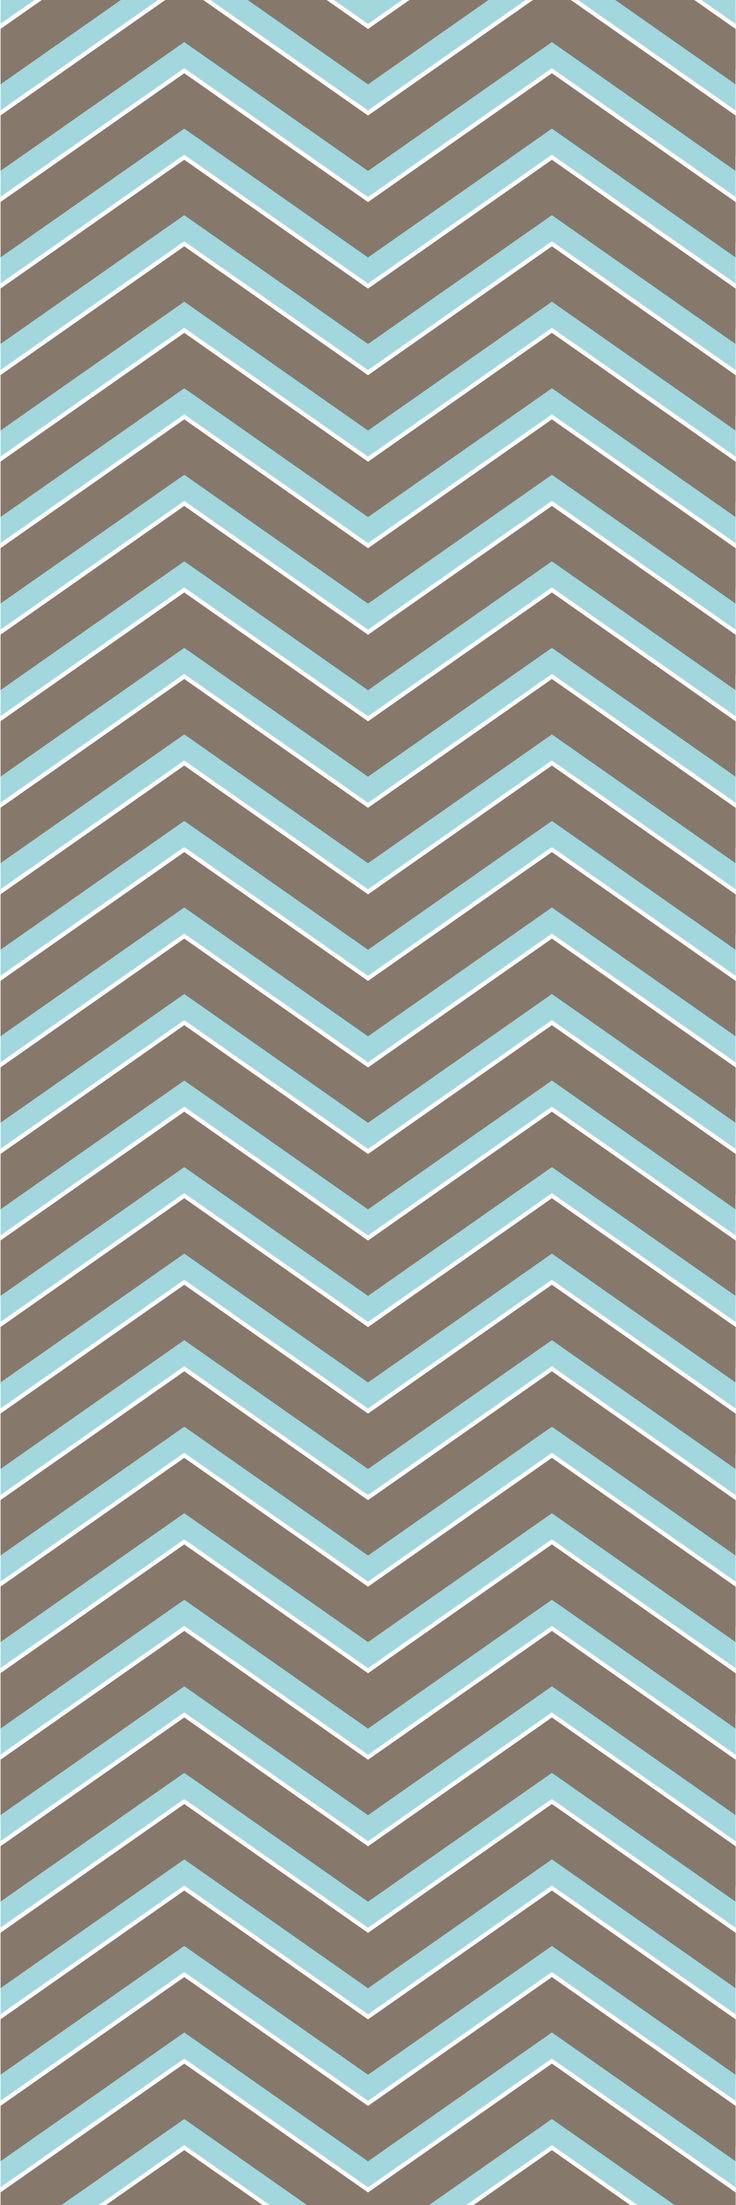 Custom printed Chevron wallpaper from the 'EMU' colour range #chevron #wallpaper #muurgraphics